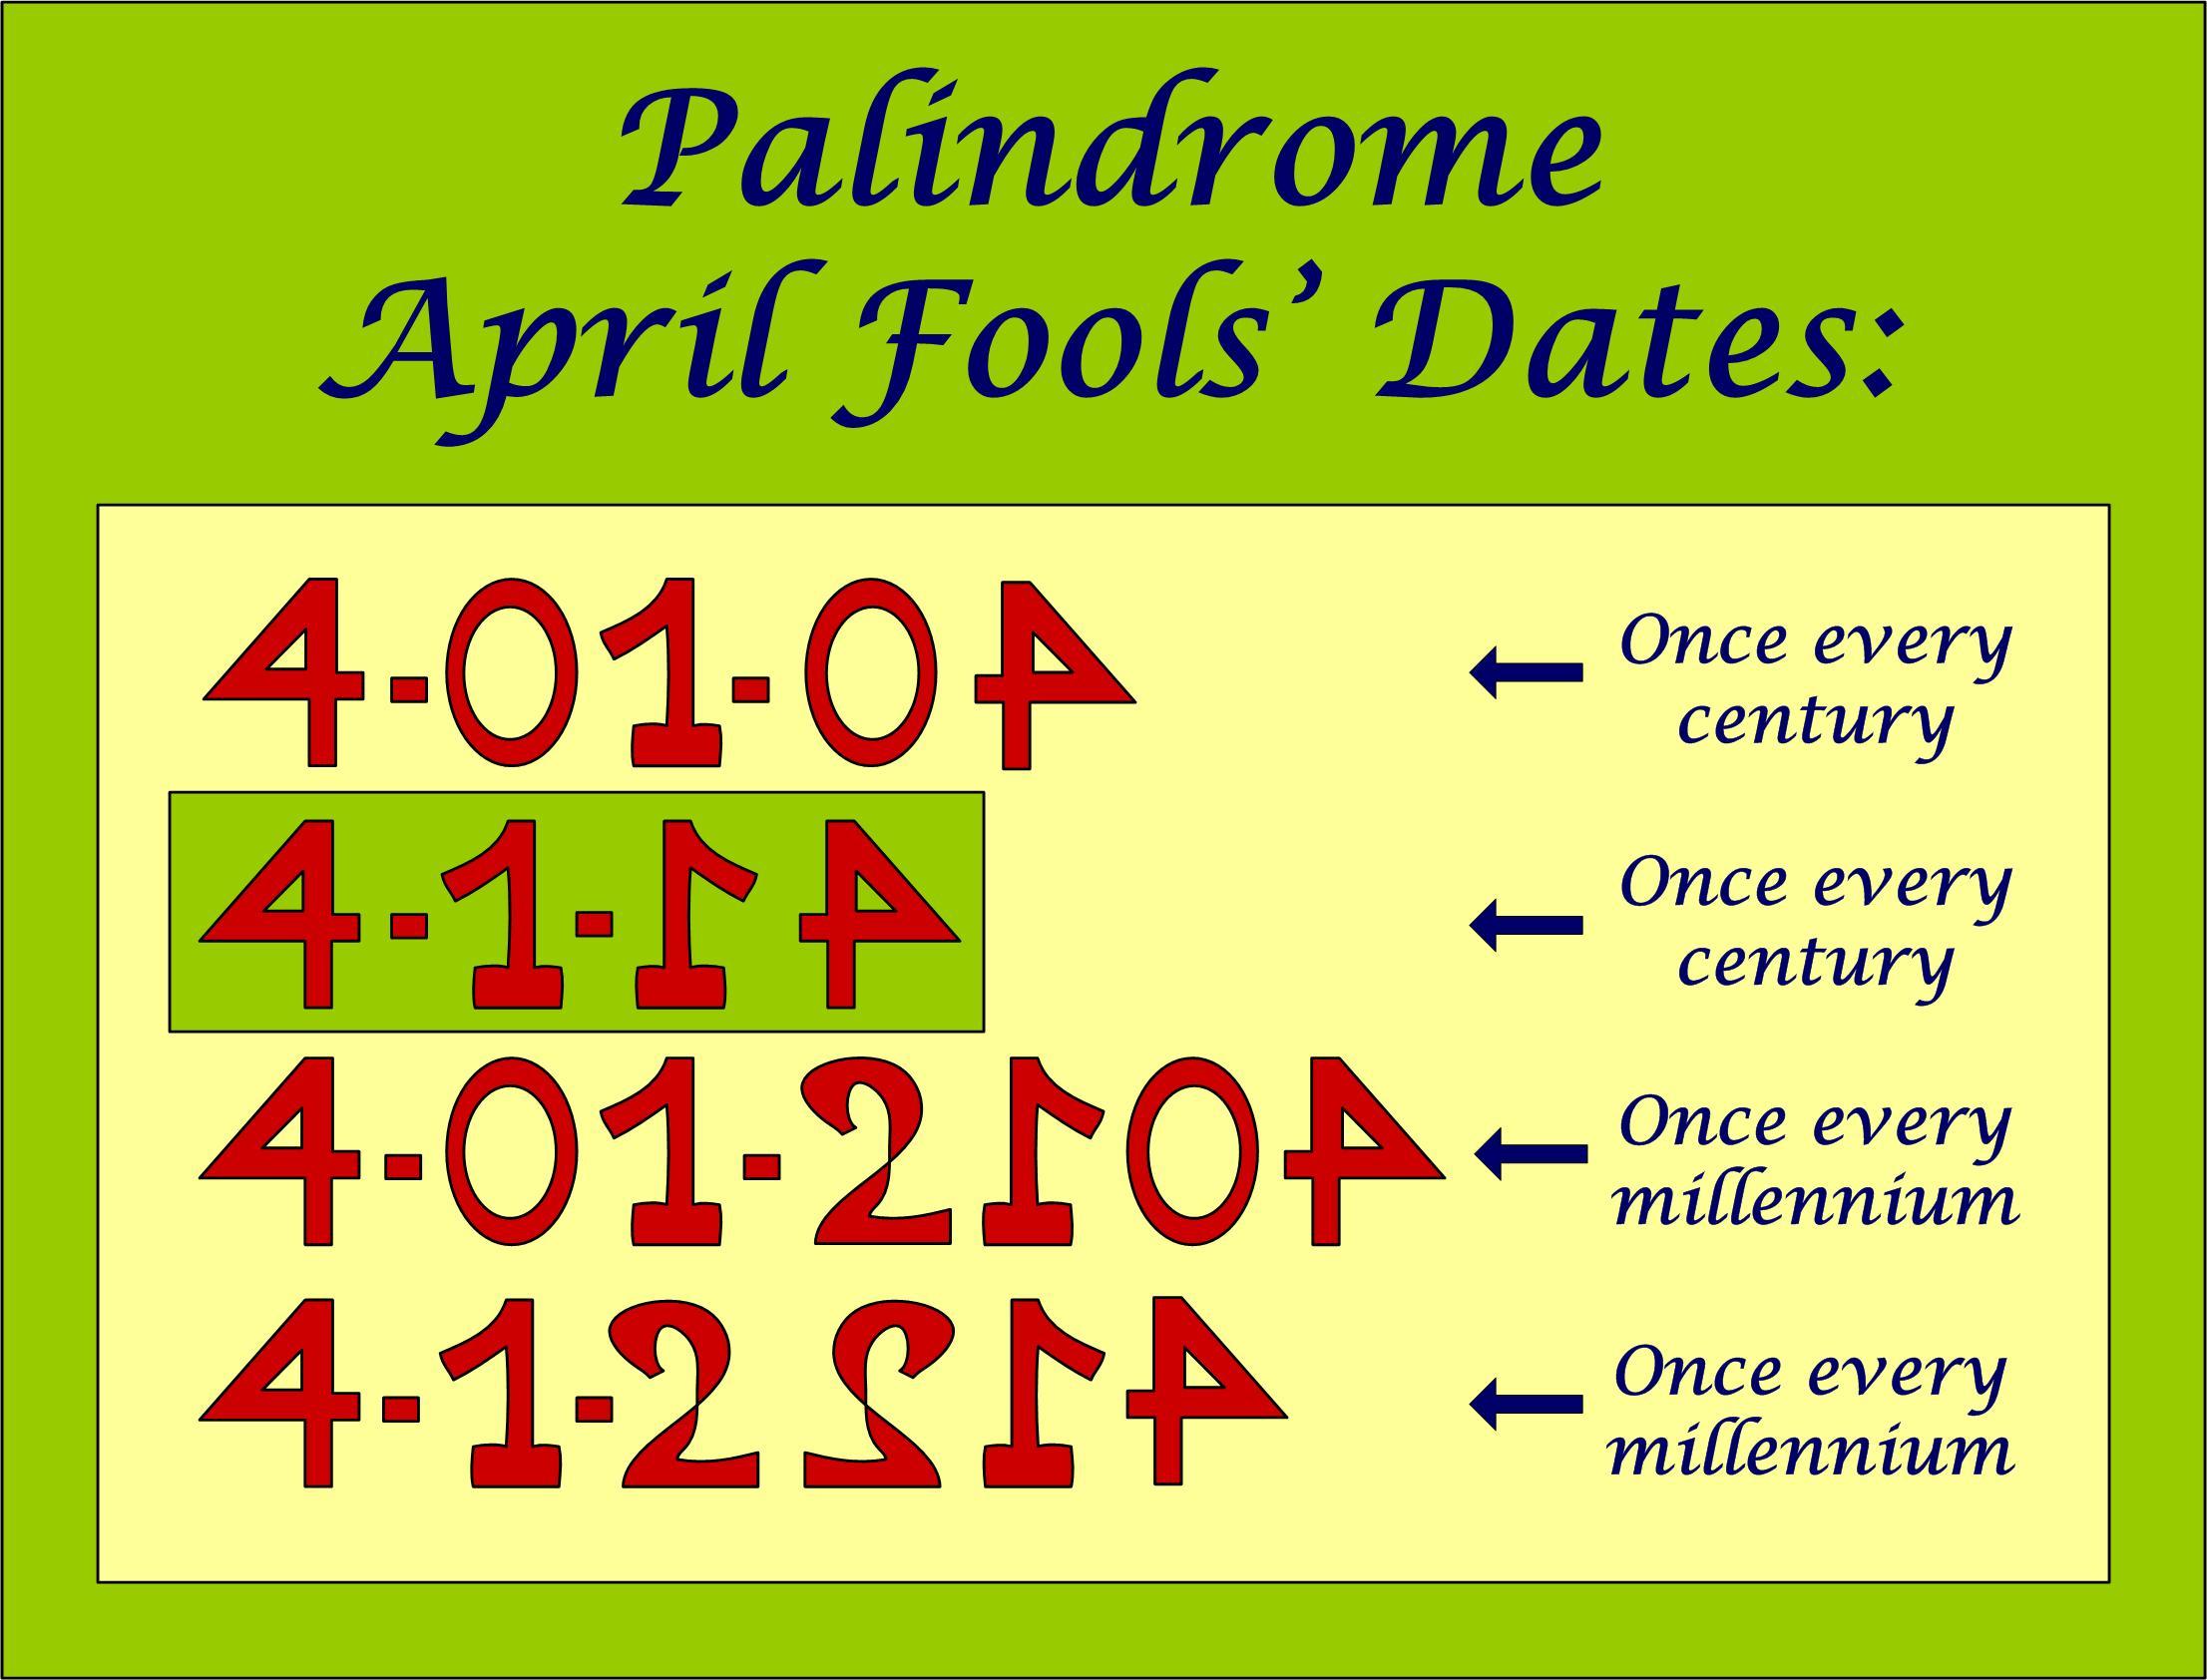 Palindrome Dates: 21st Century